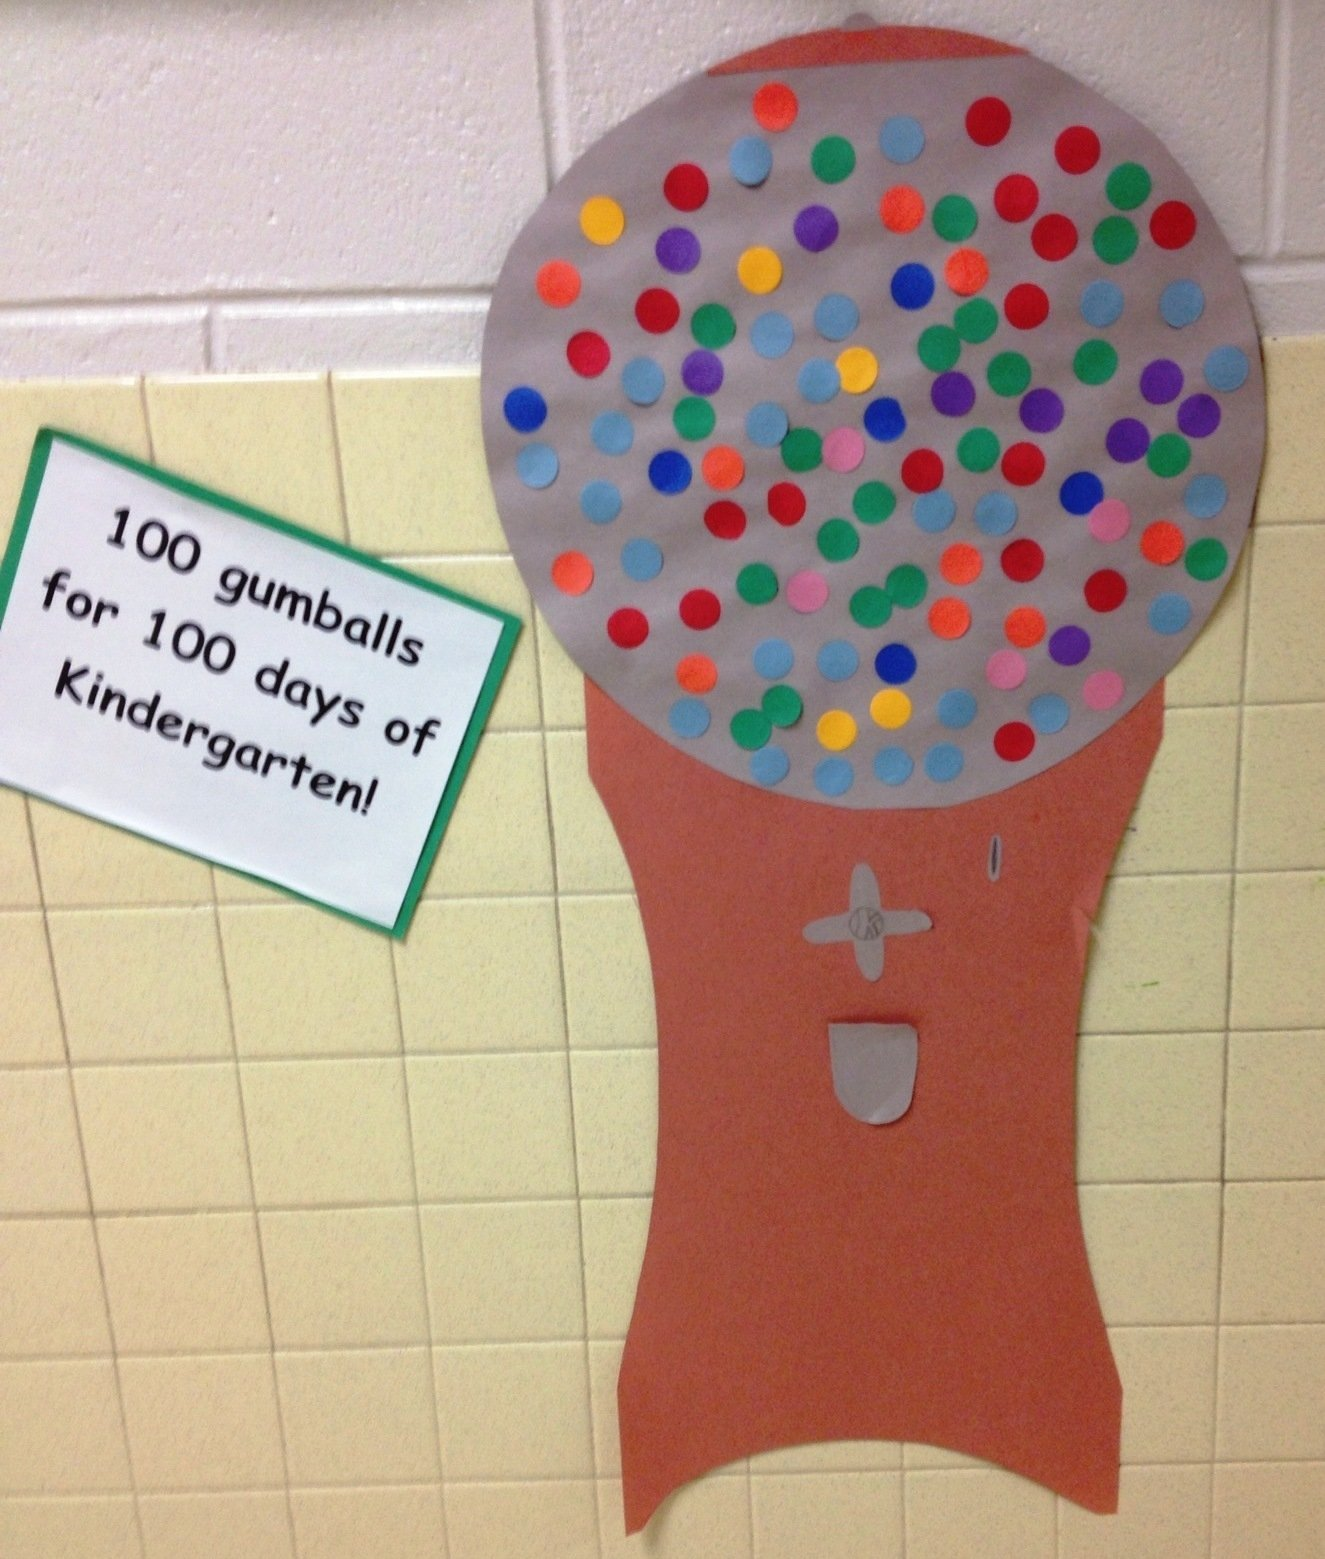 10 Wonderful 100 Day Of School Ideas For Kindergarten kindergarten is crazy fun the 100th day of kindergarten 1 2020